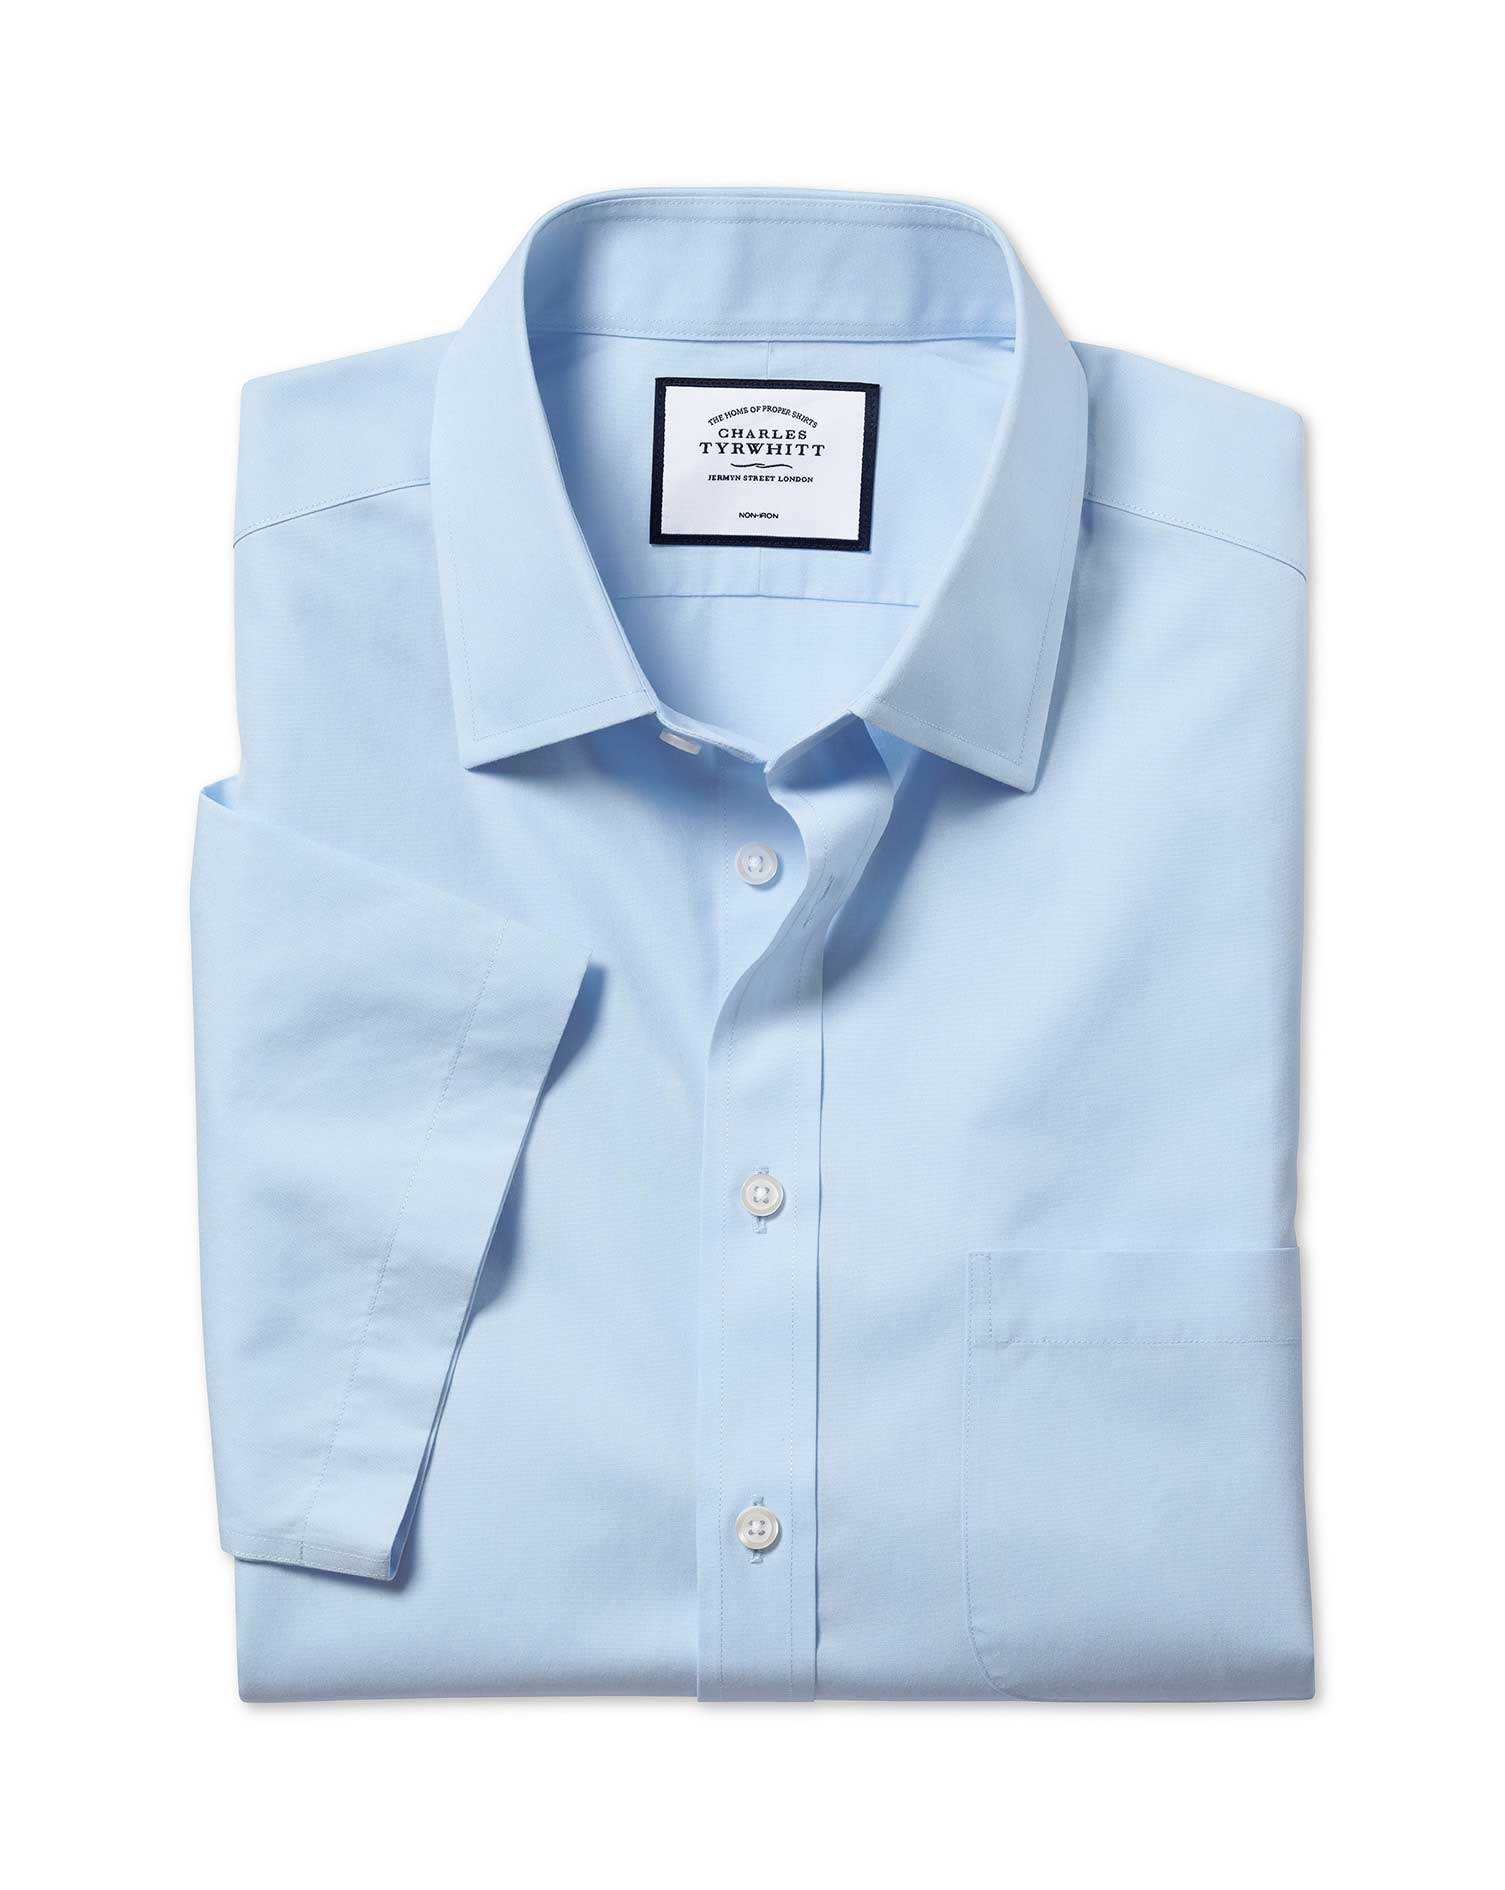 Classic Fit Non-Iron Sky Blue Tyrwhitt Cool Short Sleeve Cotton Formal Shirt Size 17.5/Short by Char